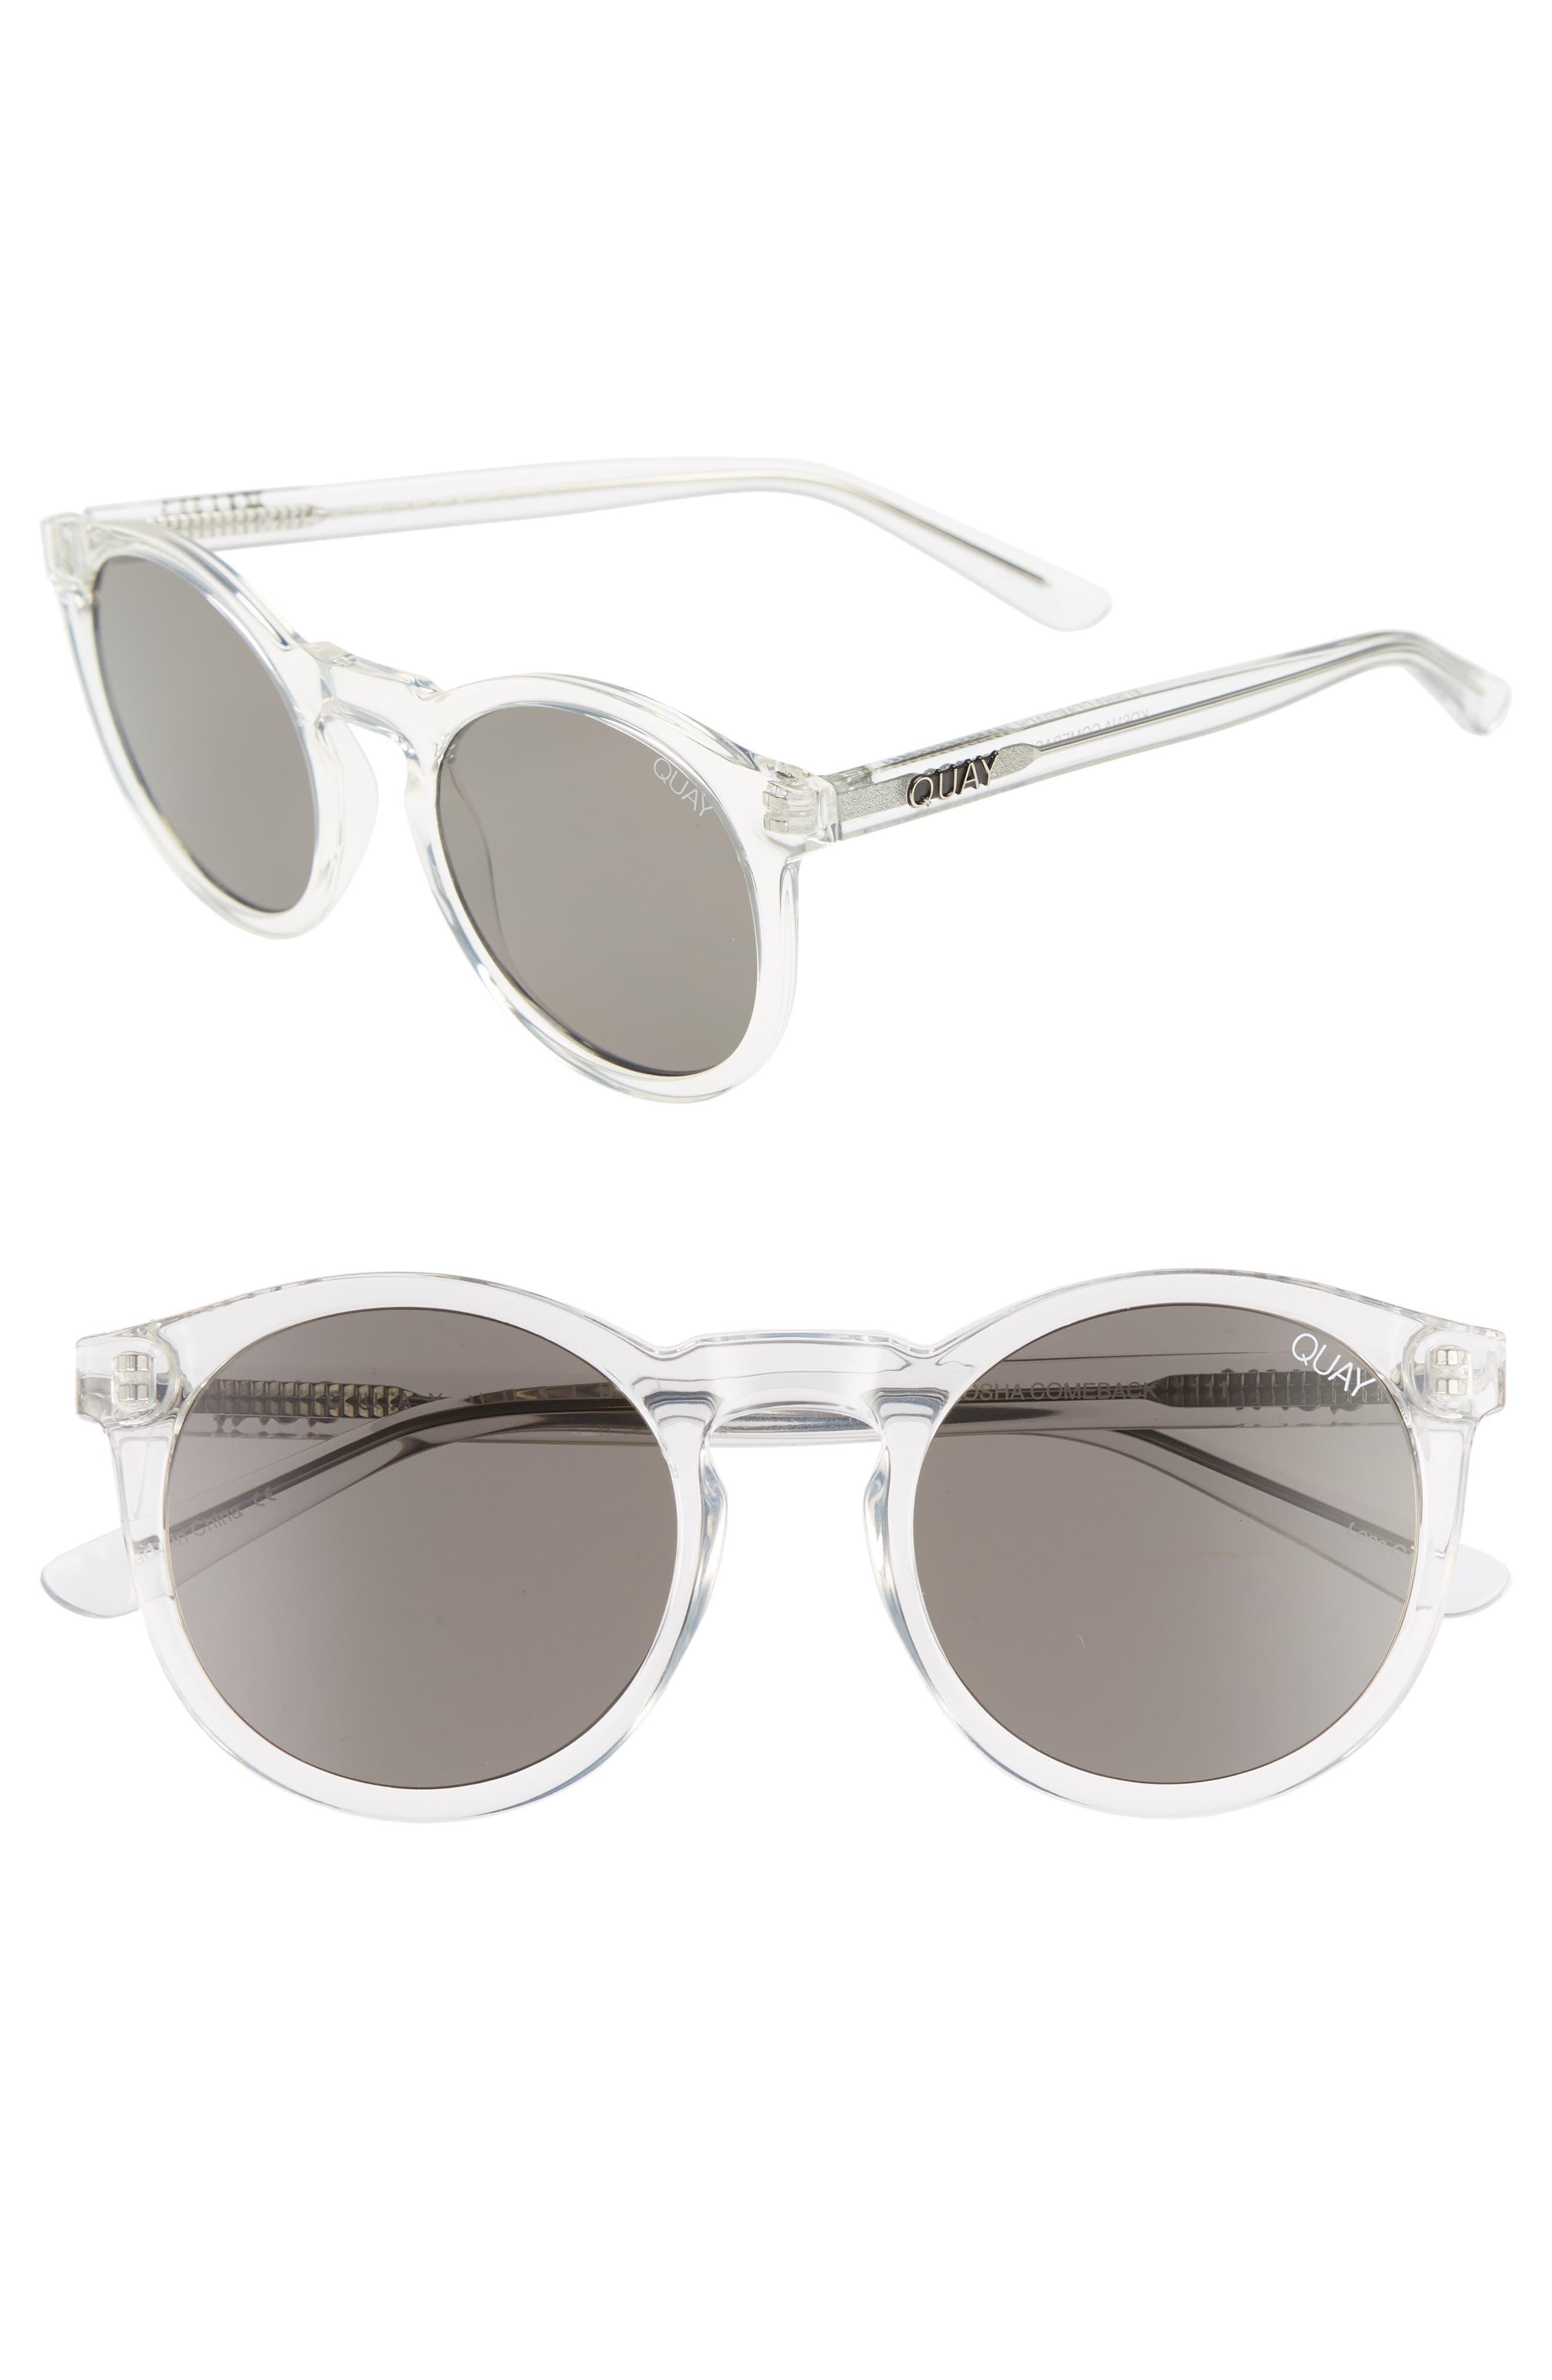 Kosha 49mm Round Sunglasses,                         Main,                         color,